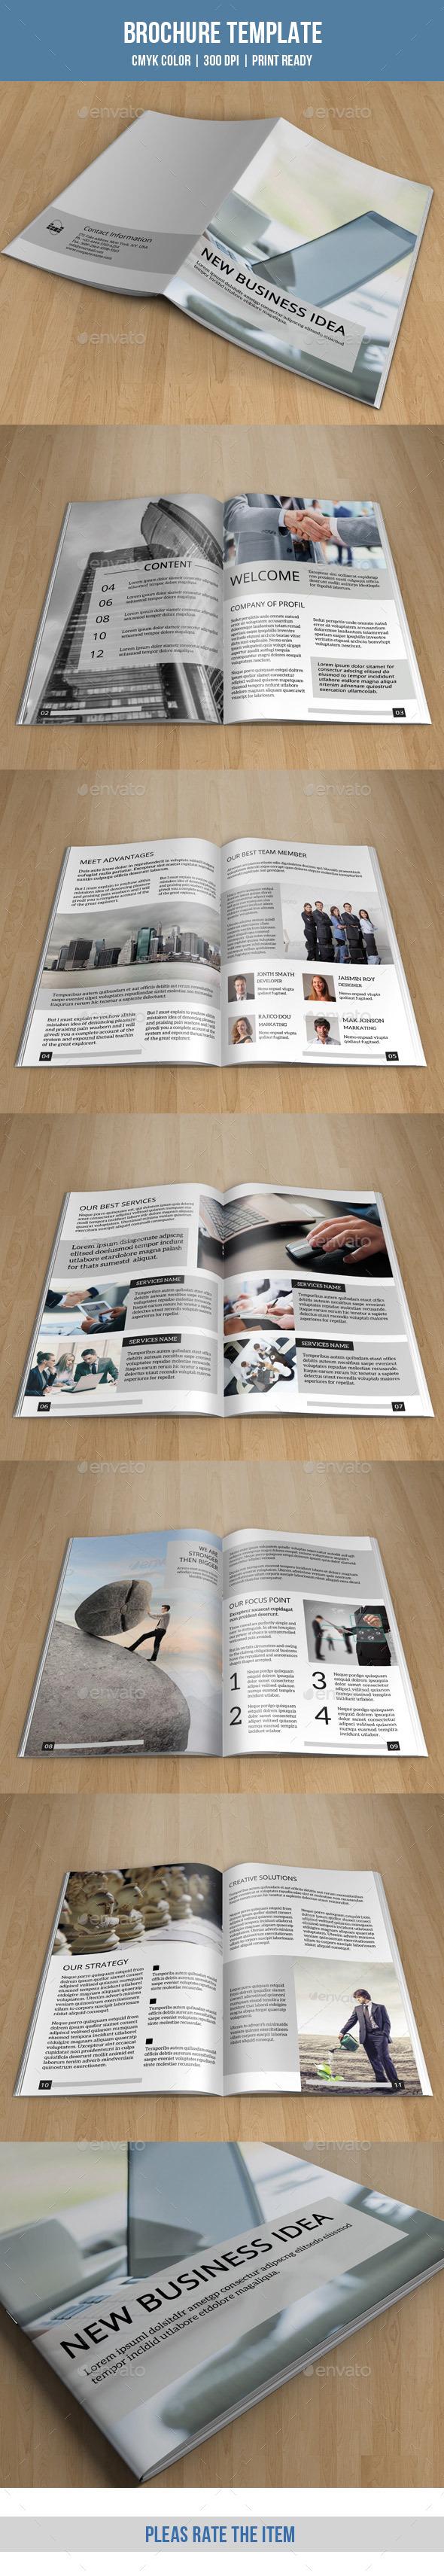 GraphicRiver Minimal Bifold Brochure-V153 9371335